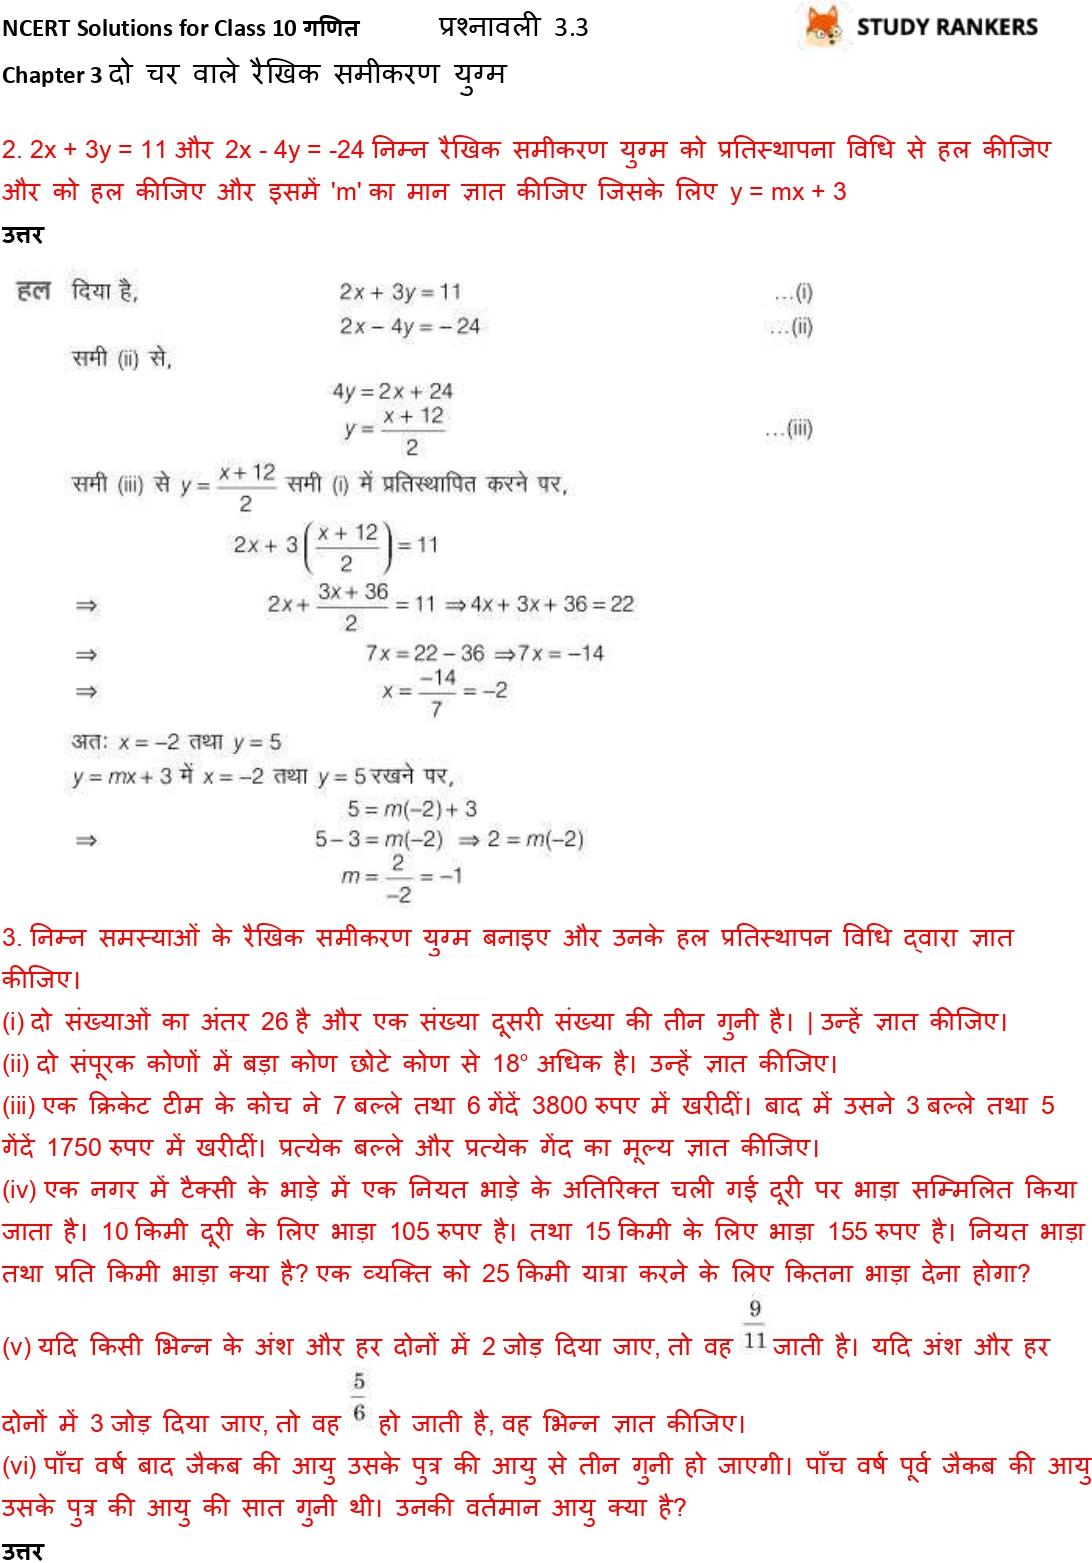 NCERT Solutions for Class 10 Maths Chapter 3 दो चर वाले रैखिक समीकरण युग्म प्रश्नावली 3.3 Part 4